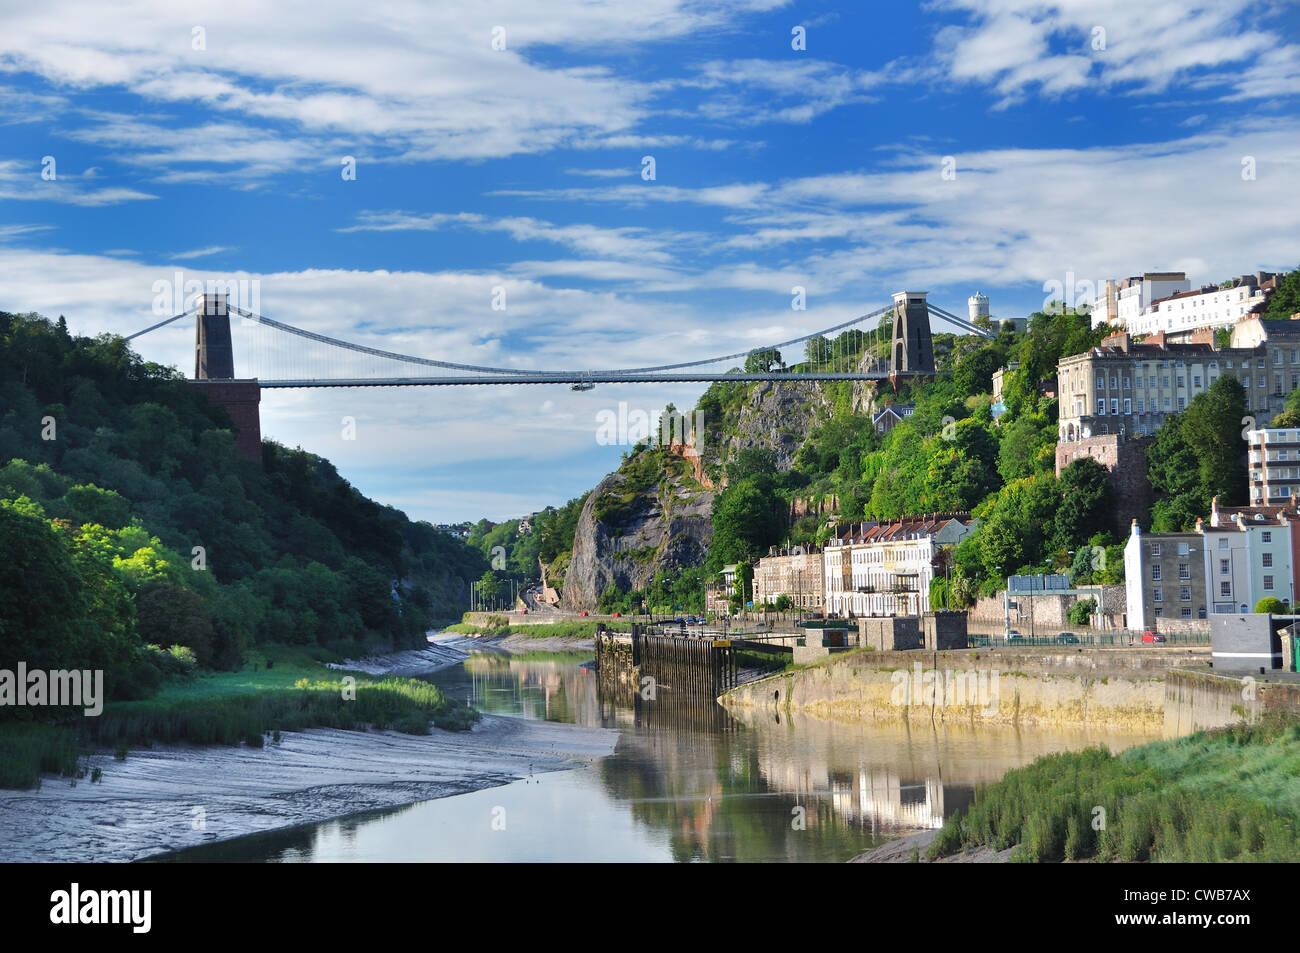 UK Bristol River Avon Clifton Suspension Bridge Spanning Avon Gorge - Stock Image